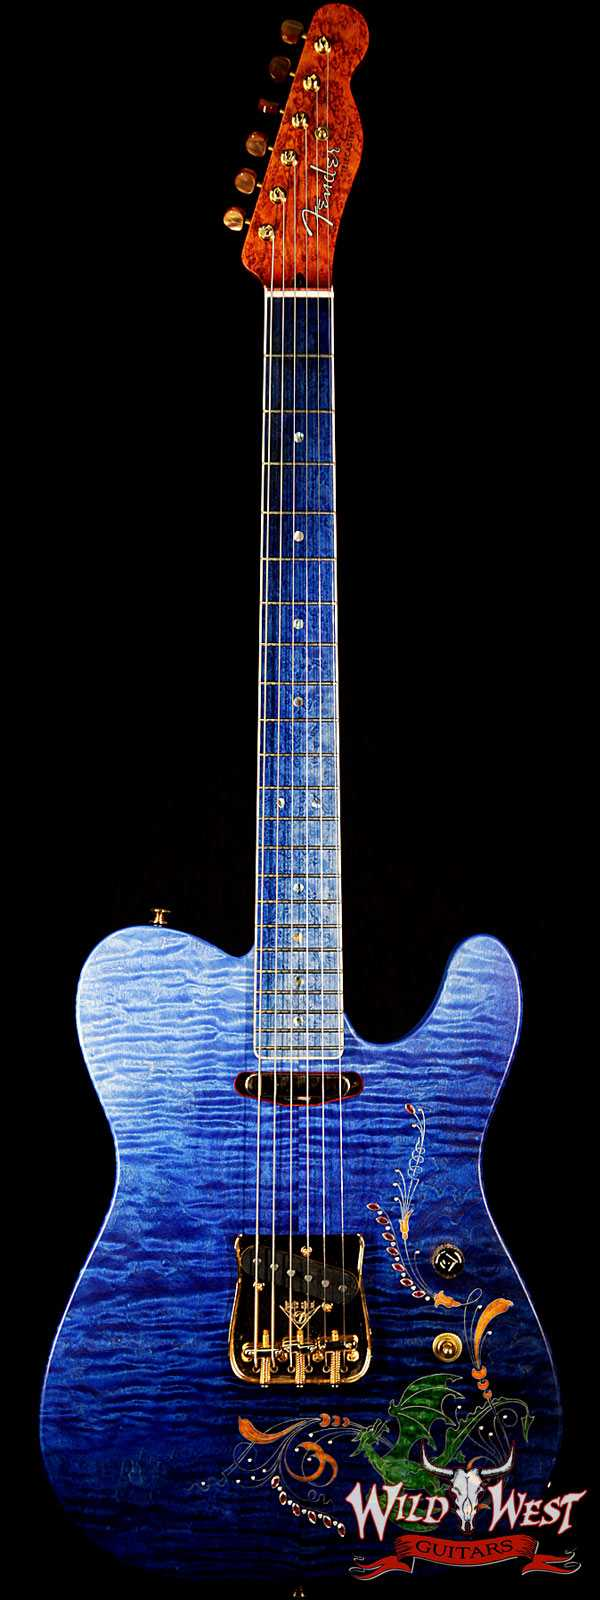 Fender Custom Shop Masterbuilt Defender Telecaster by Yuriy Shishkov